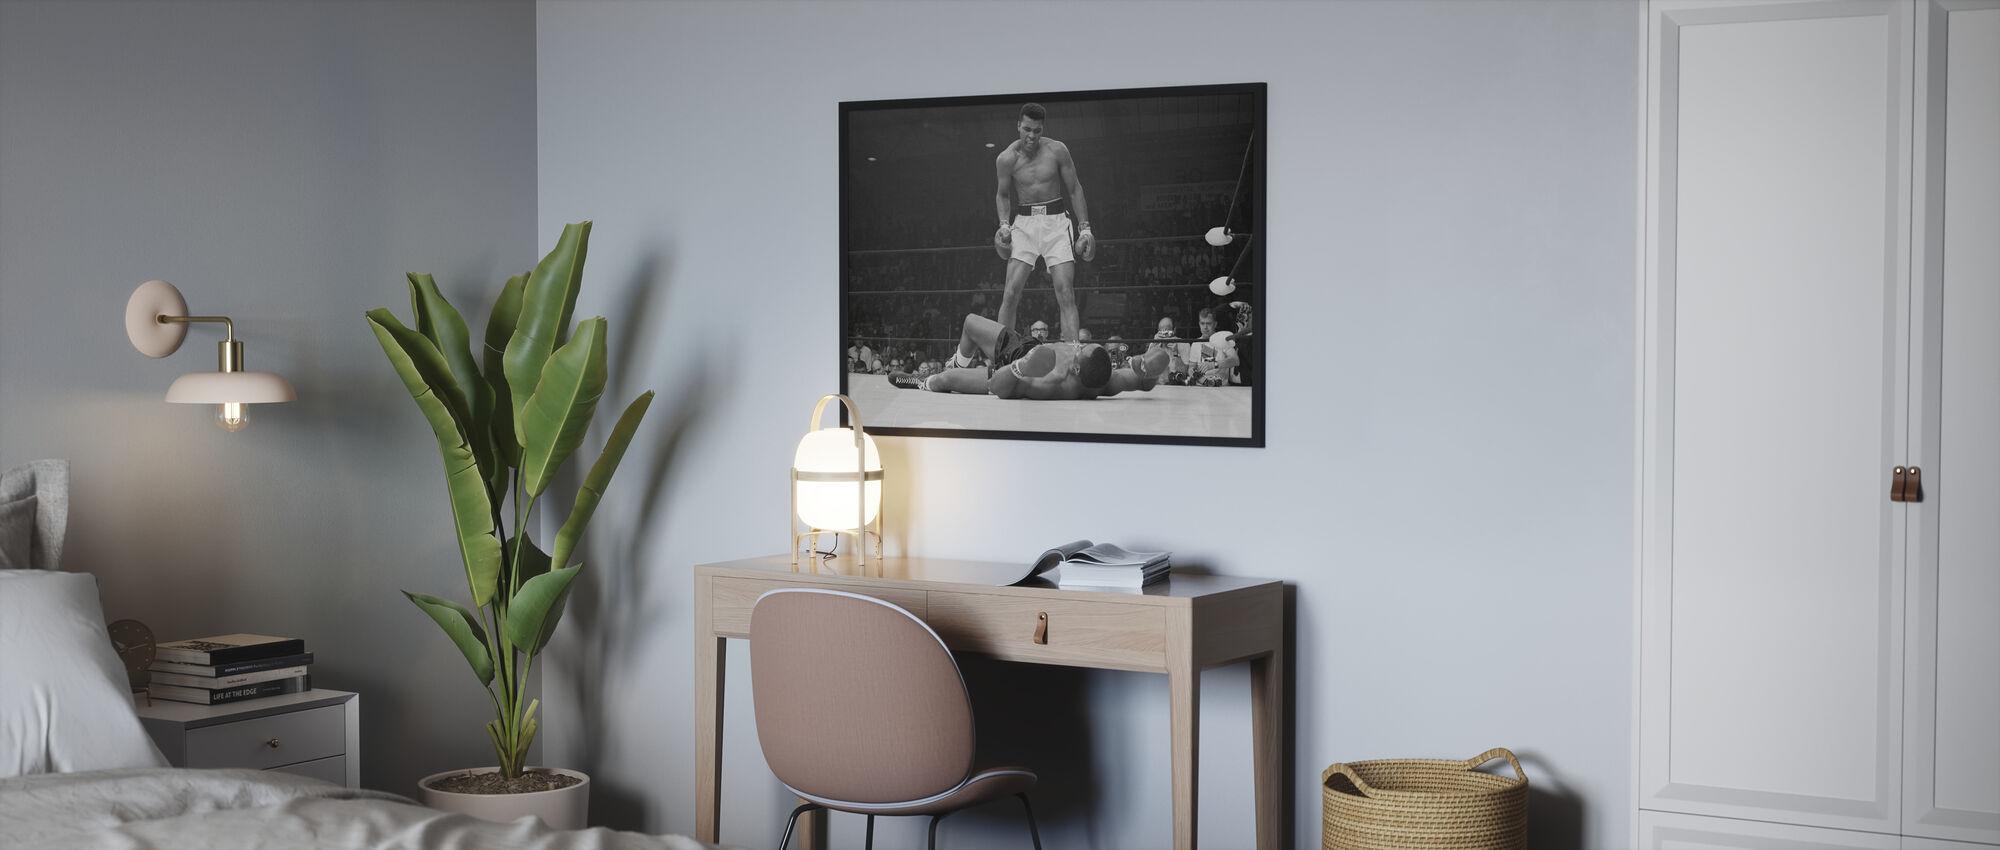 Muhammad Ali vs Sonny Liston - Gerahmtes bild - Schlafzimmer